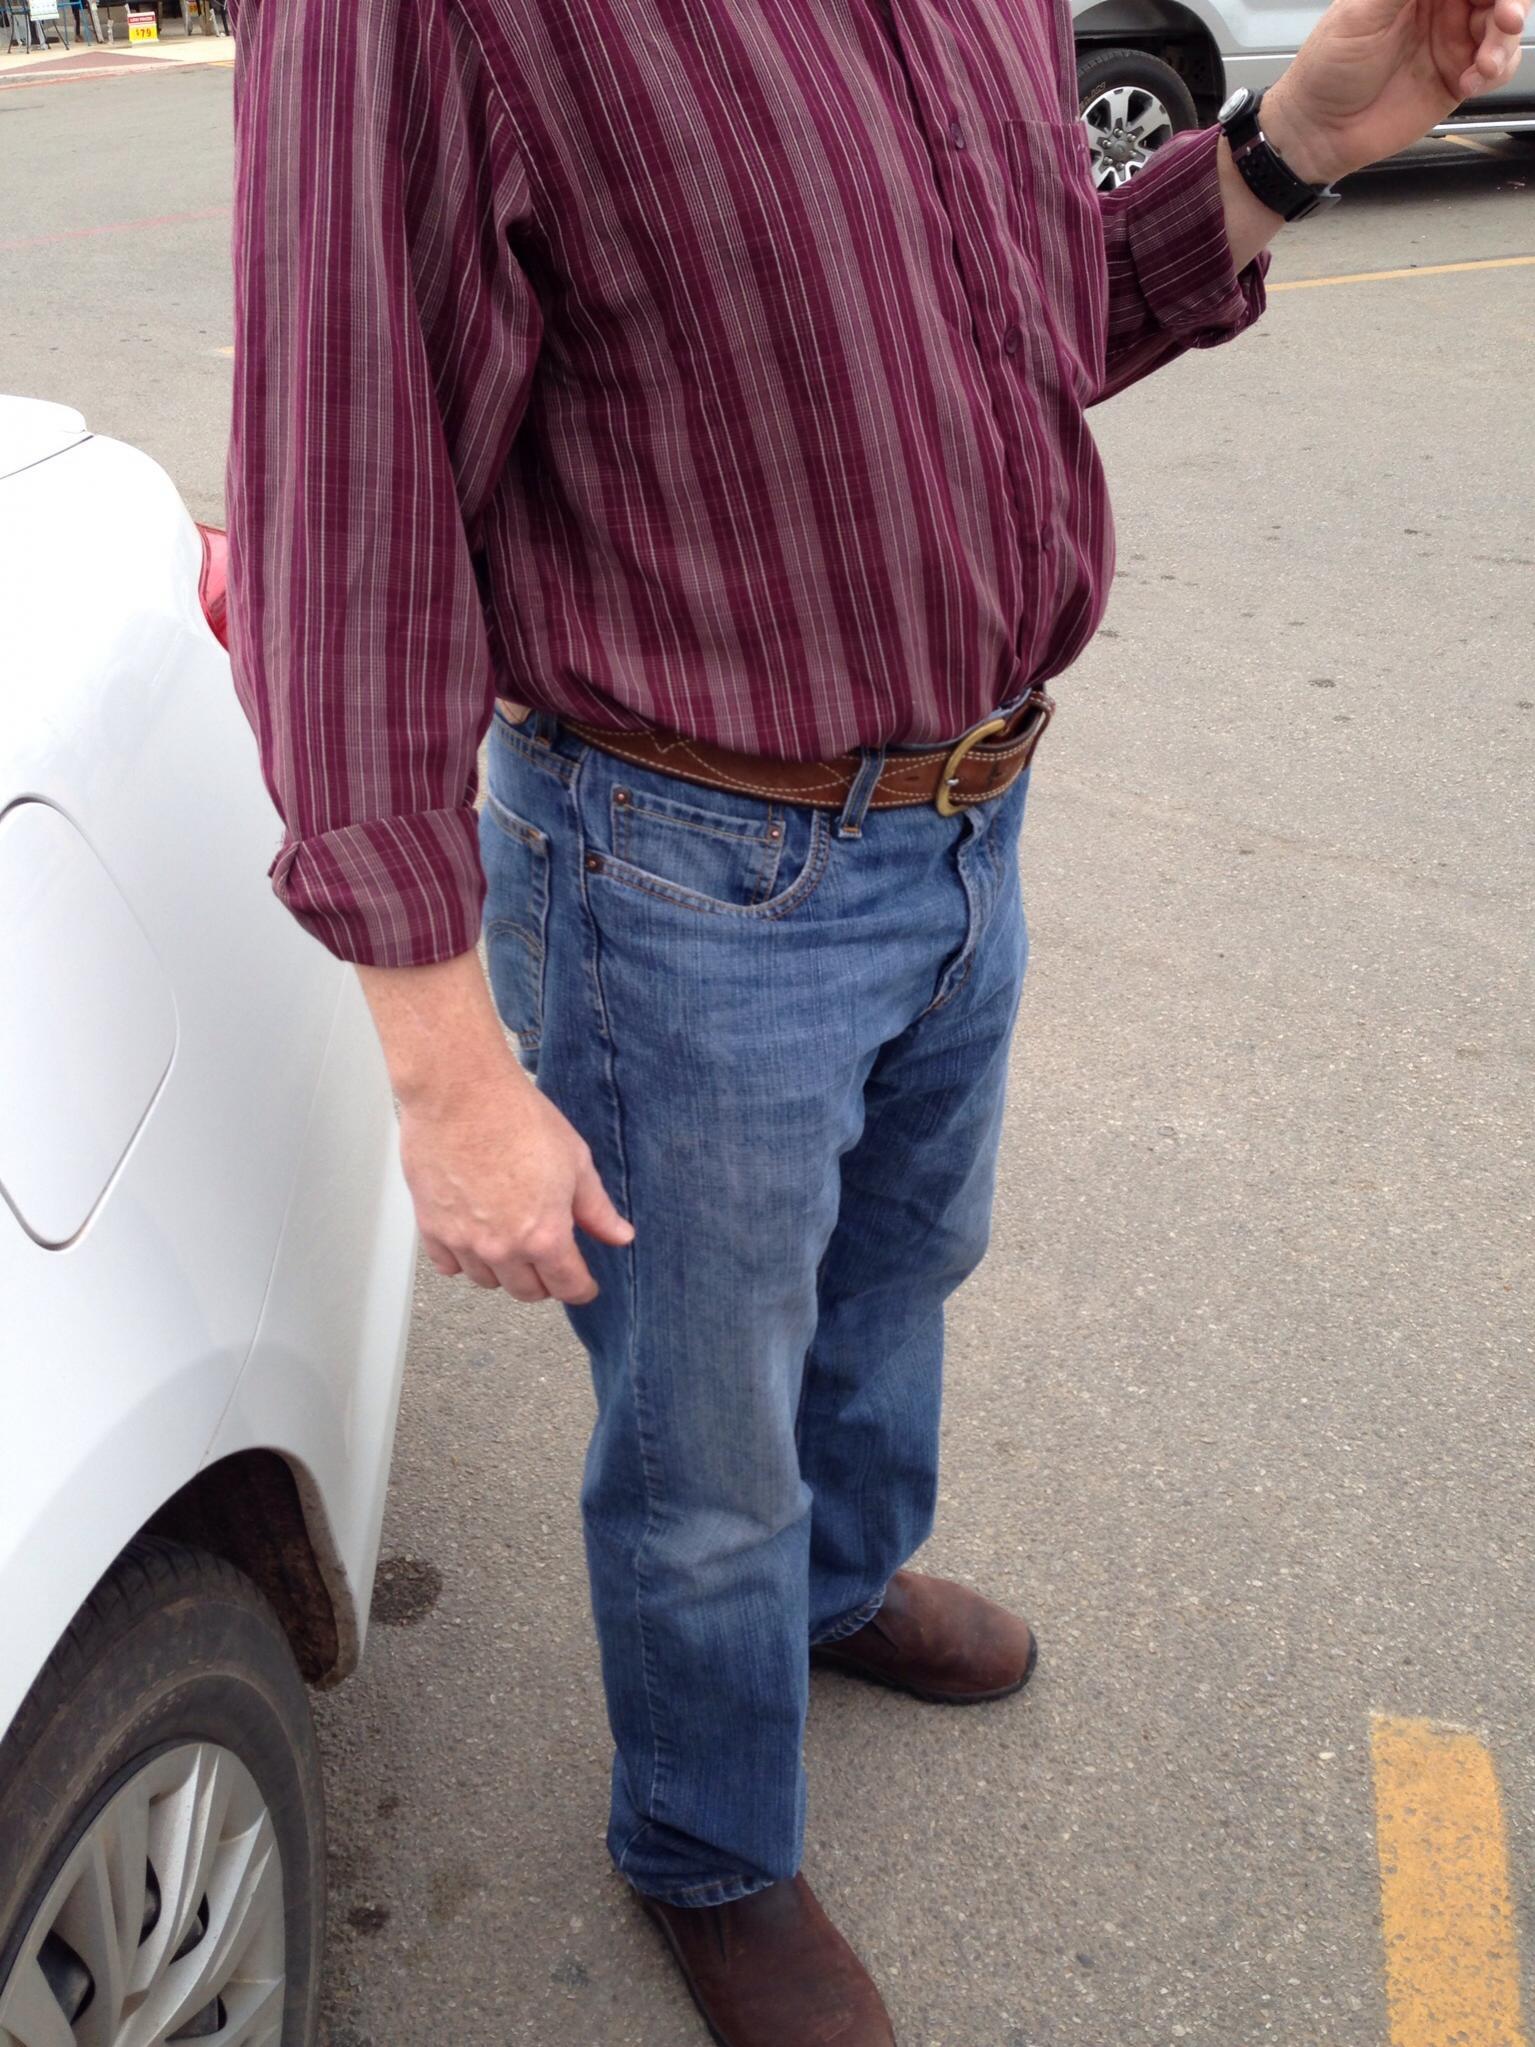 Improvised carry in Texas-image.jpg